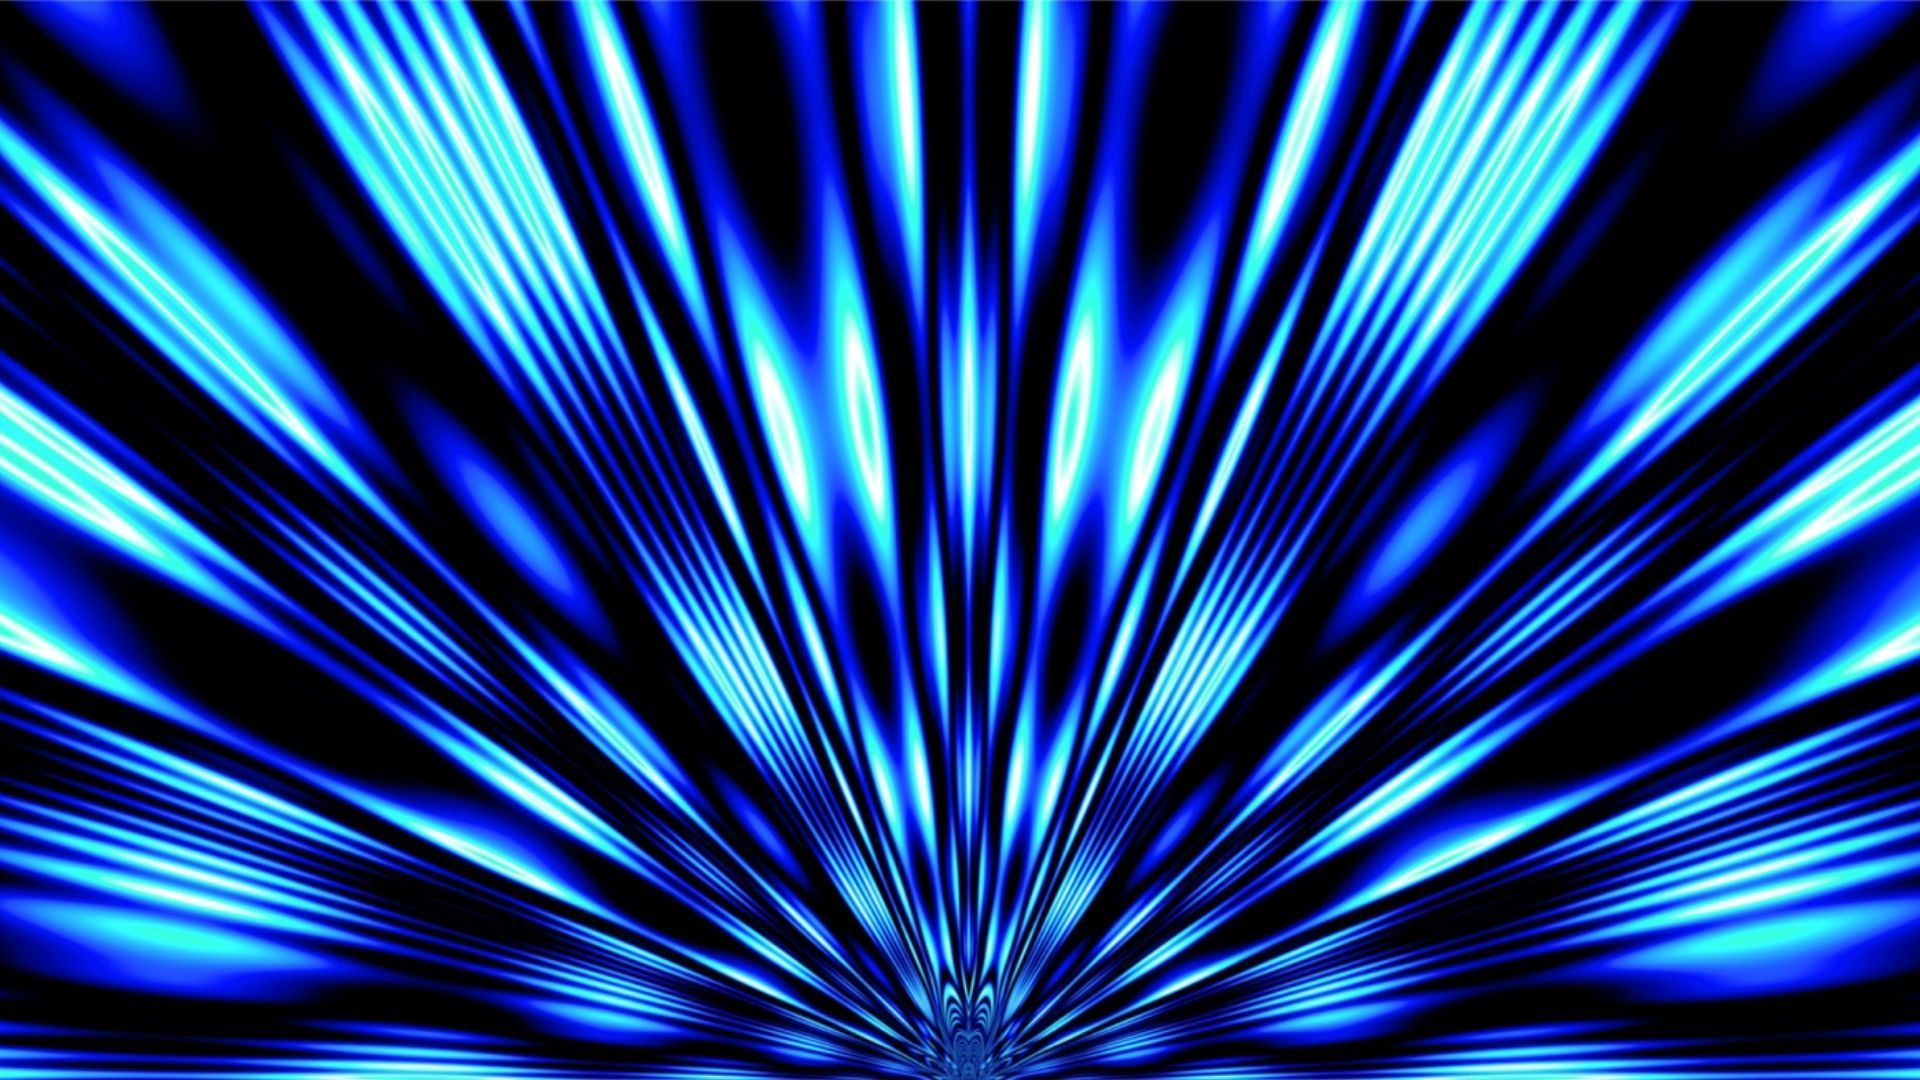 Shiny Download Wallpaper